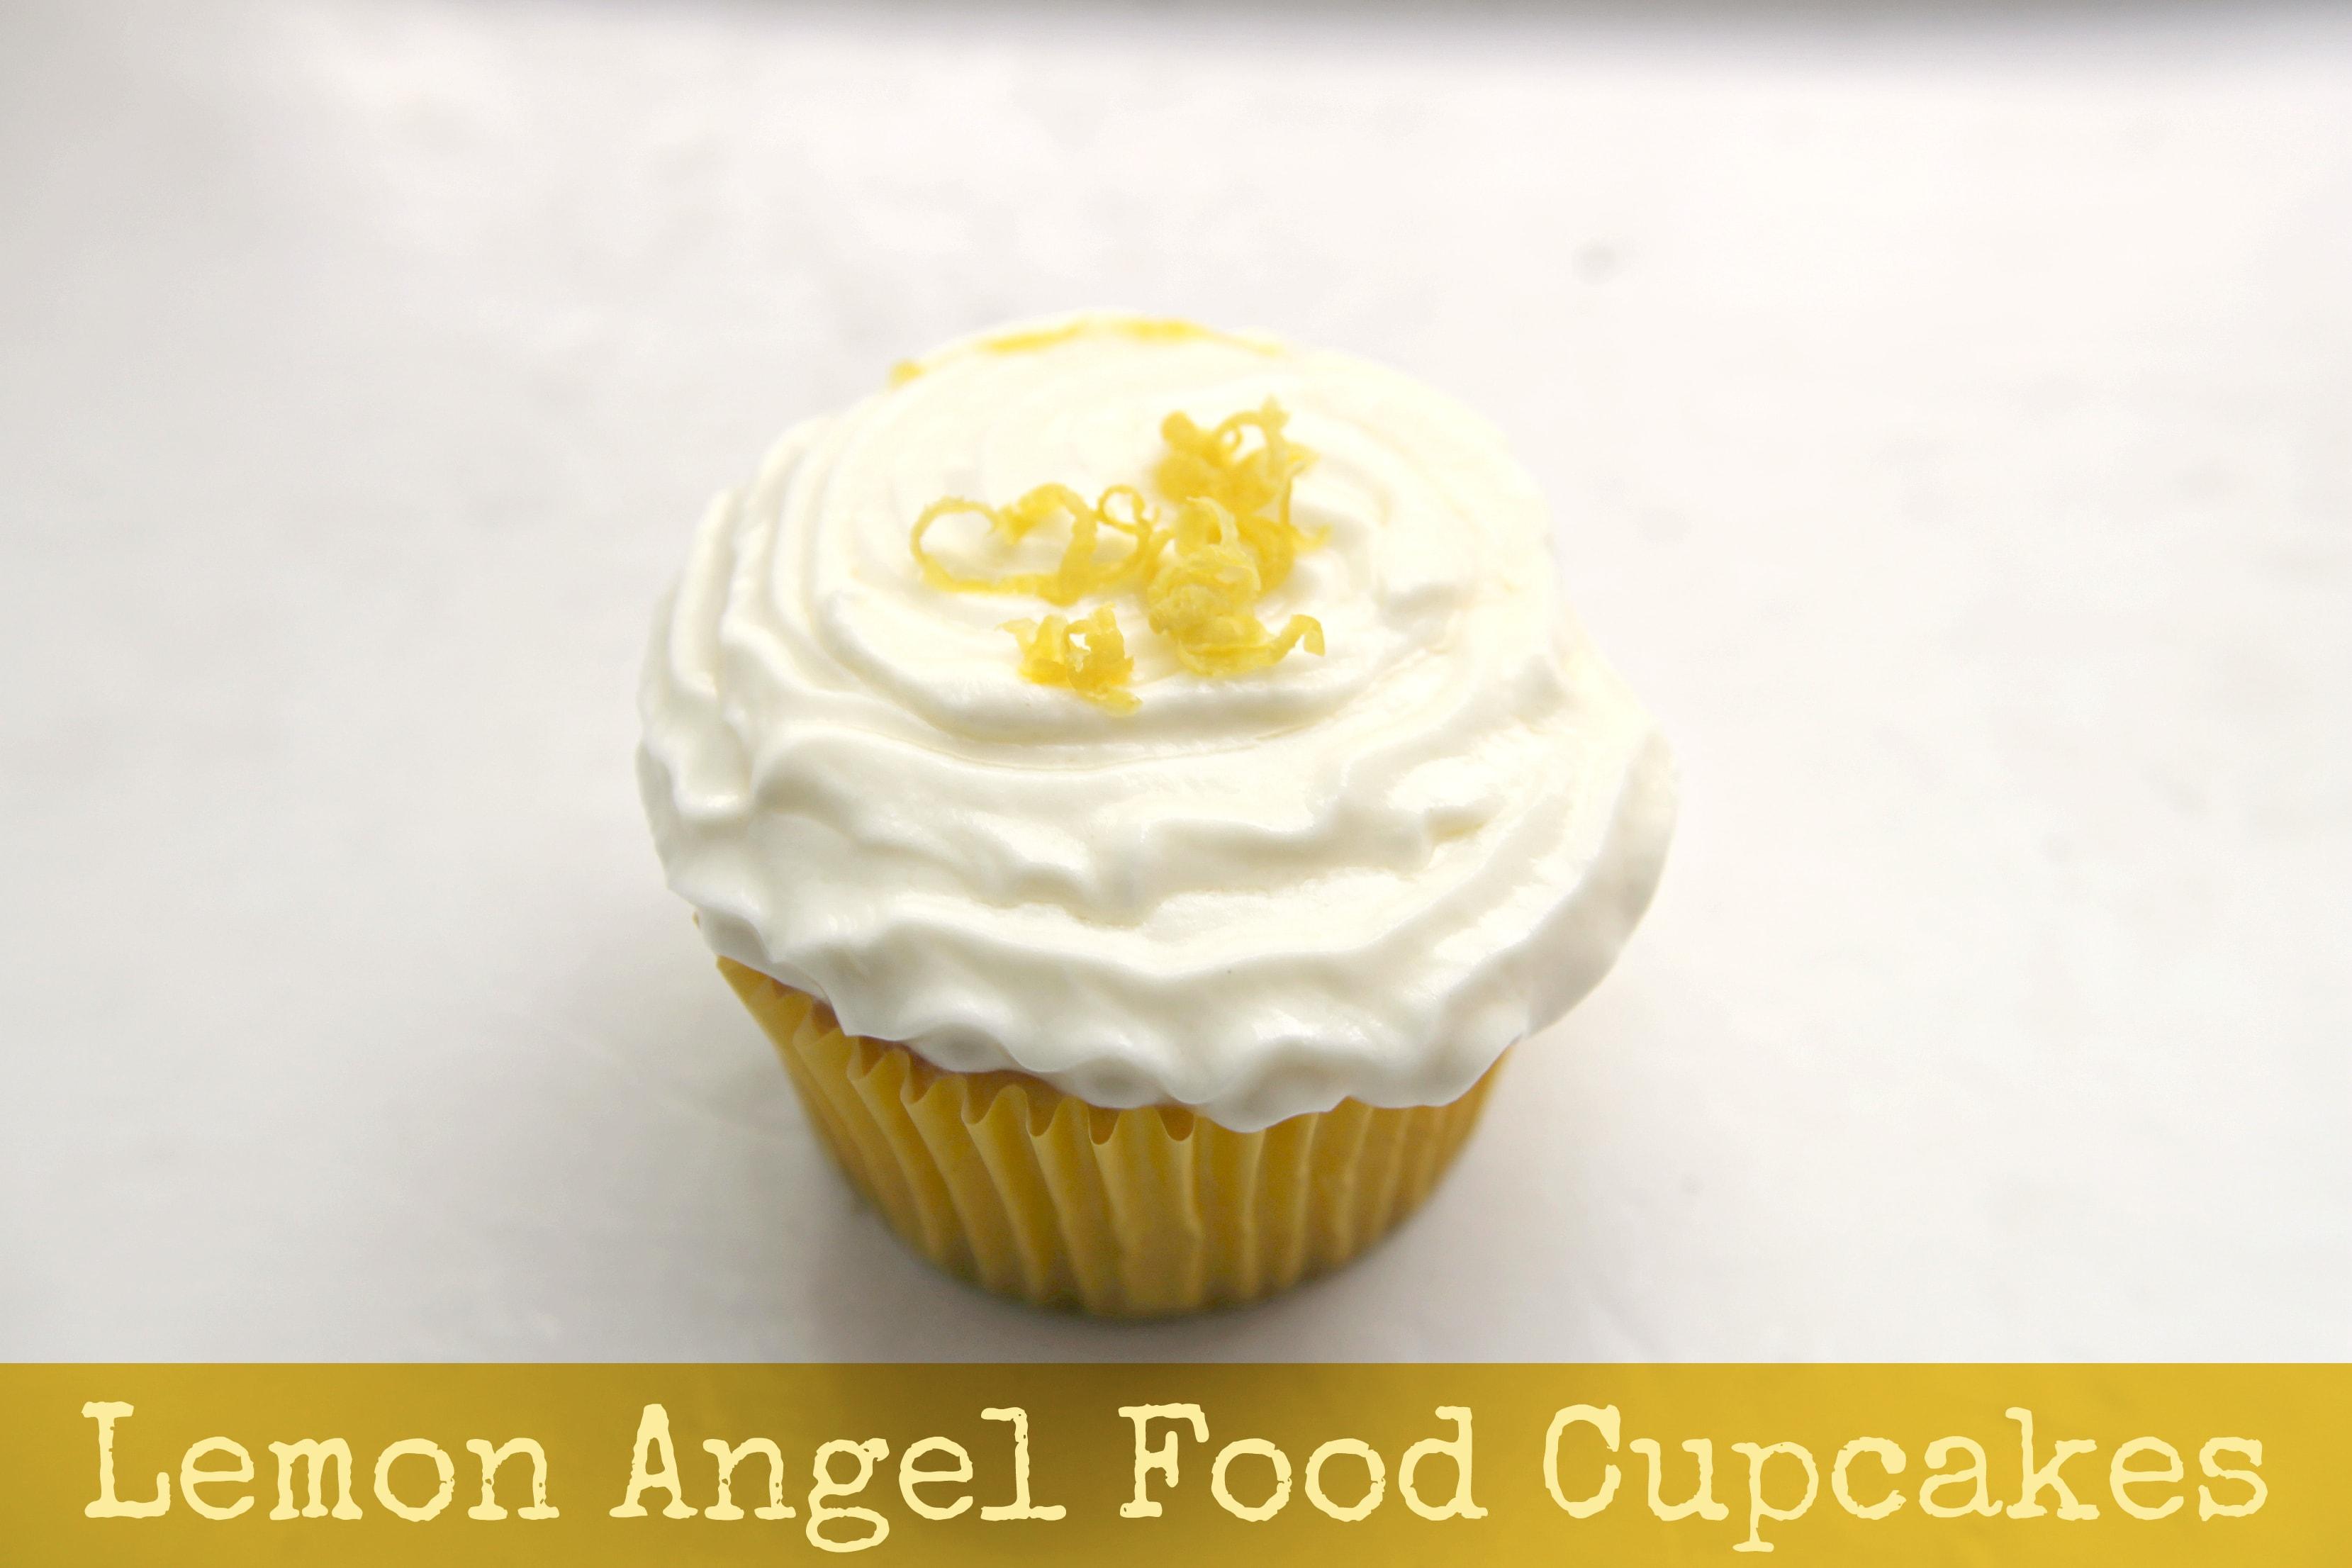 ... Stewart into a cupcake recipe to make these Lemon Angel Food Cupcakes